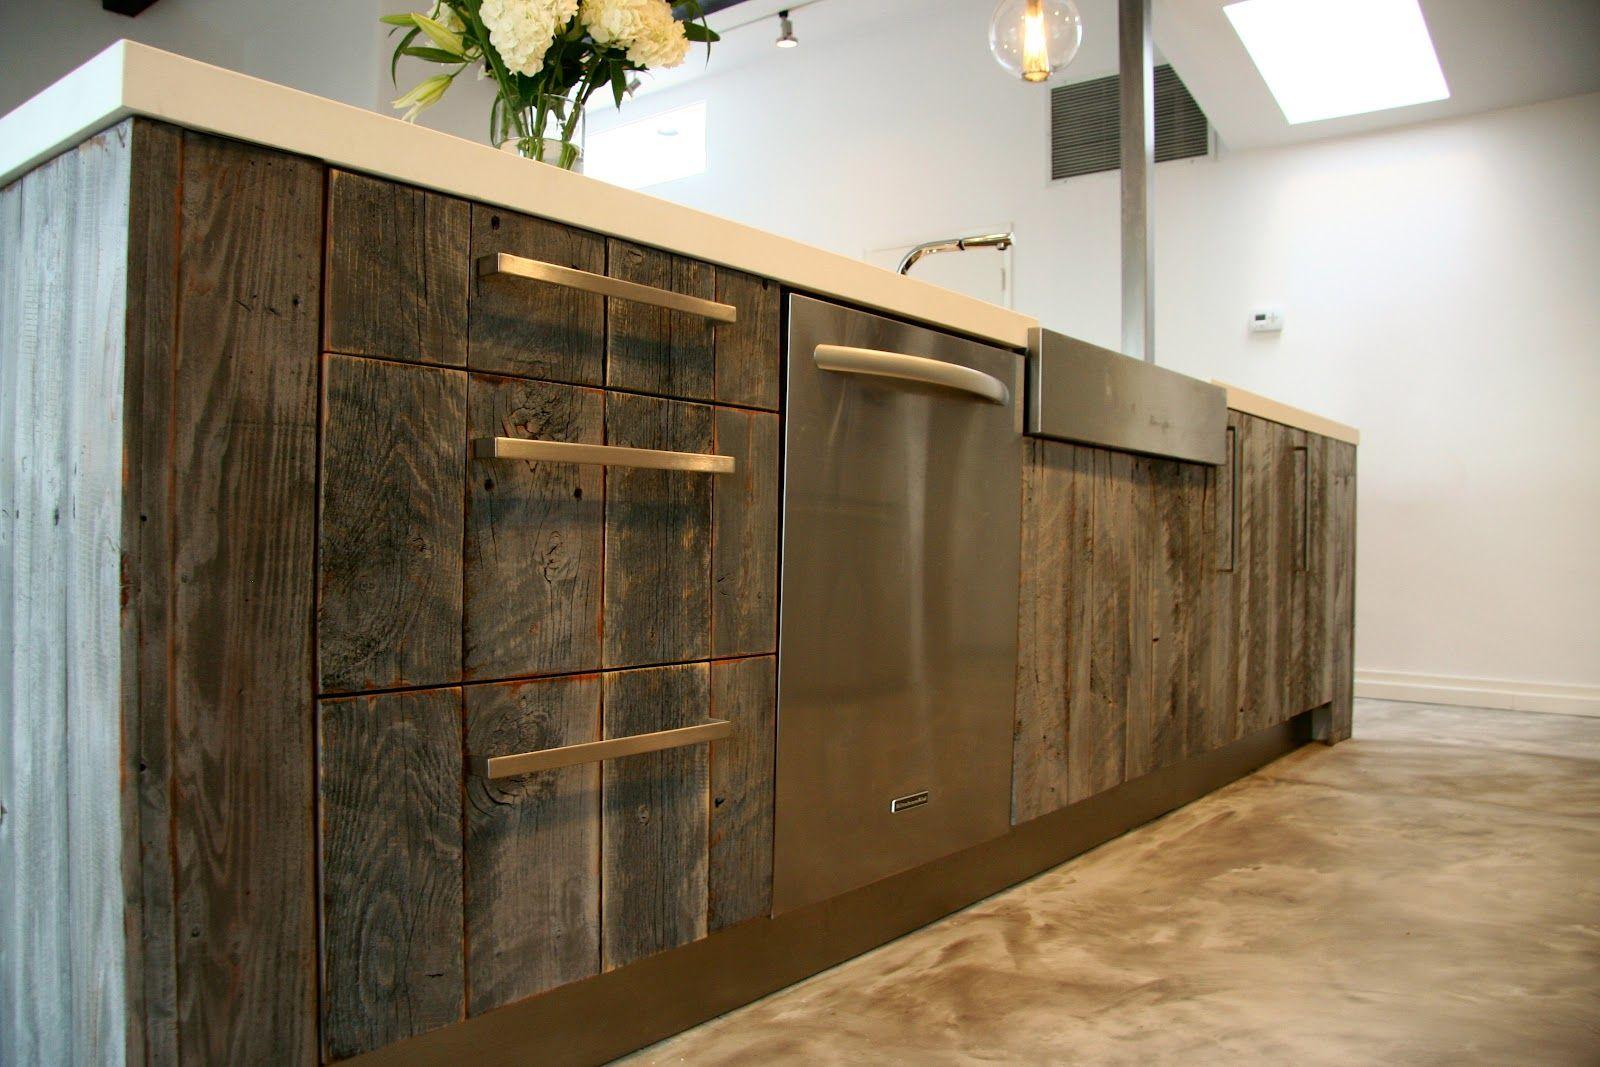 Sherman Oaks Ikea Kitchen Faced in Reclaimed Grey Barn Lumber We. Unique Kitchen Backsplash Ideas. Kitchen Backsplashes Kitchen Remodel Designs Mosaic Backsplash. Best 25 Small Kitchen Backsplash Ideas Onsmall